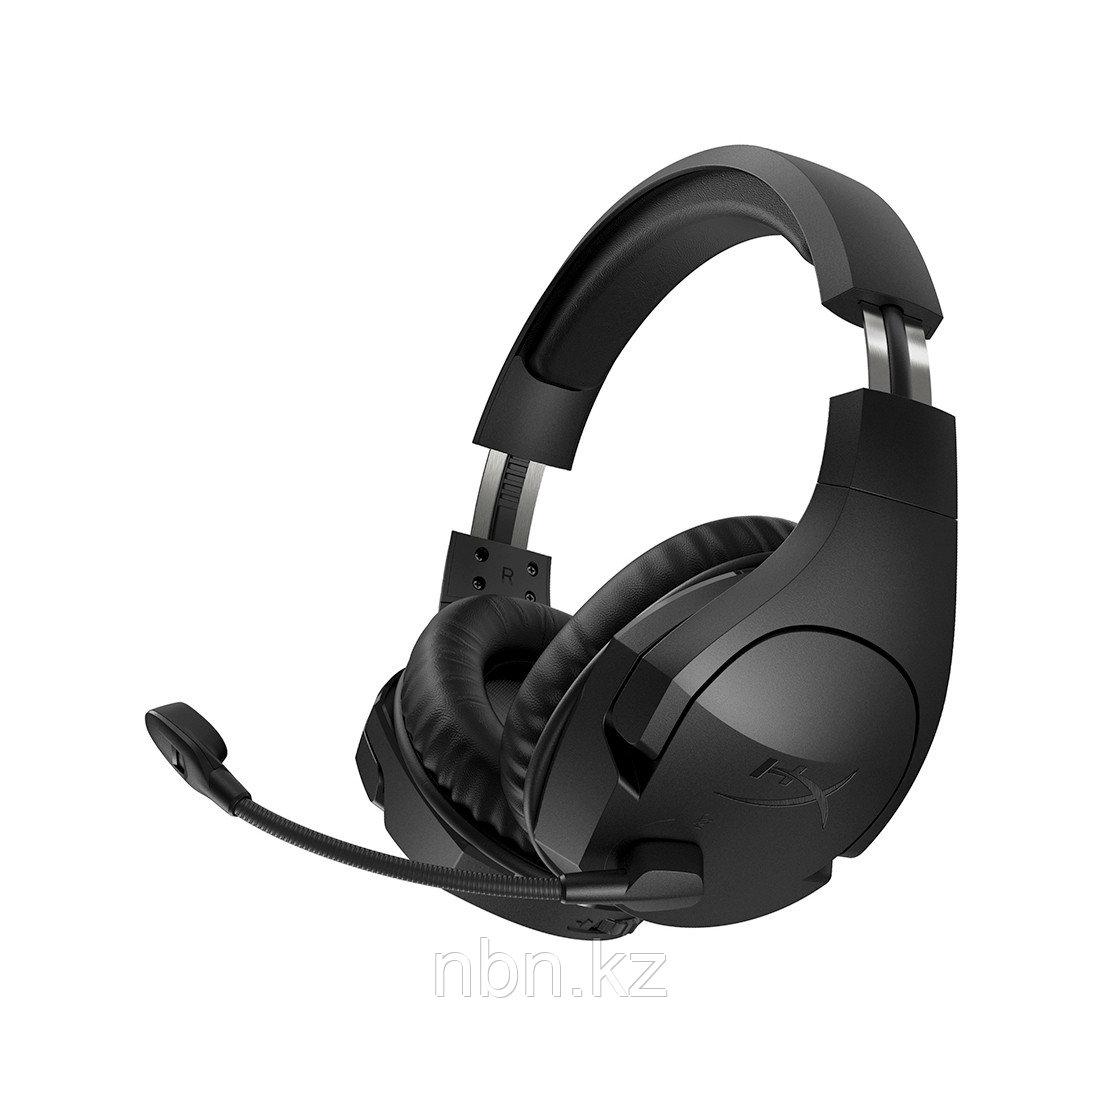 Гарнитура HyperX Cloud Stinger Wireless Gaming Headset PC Setup